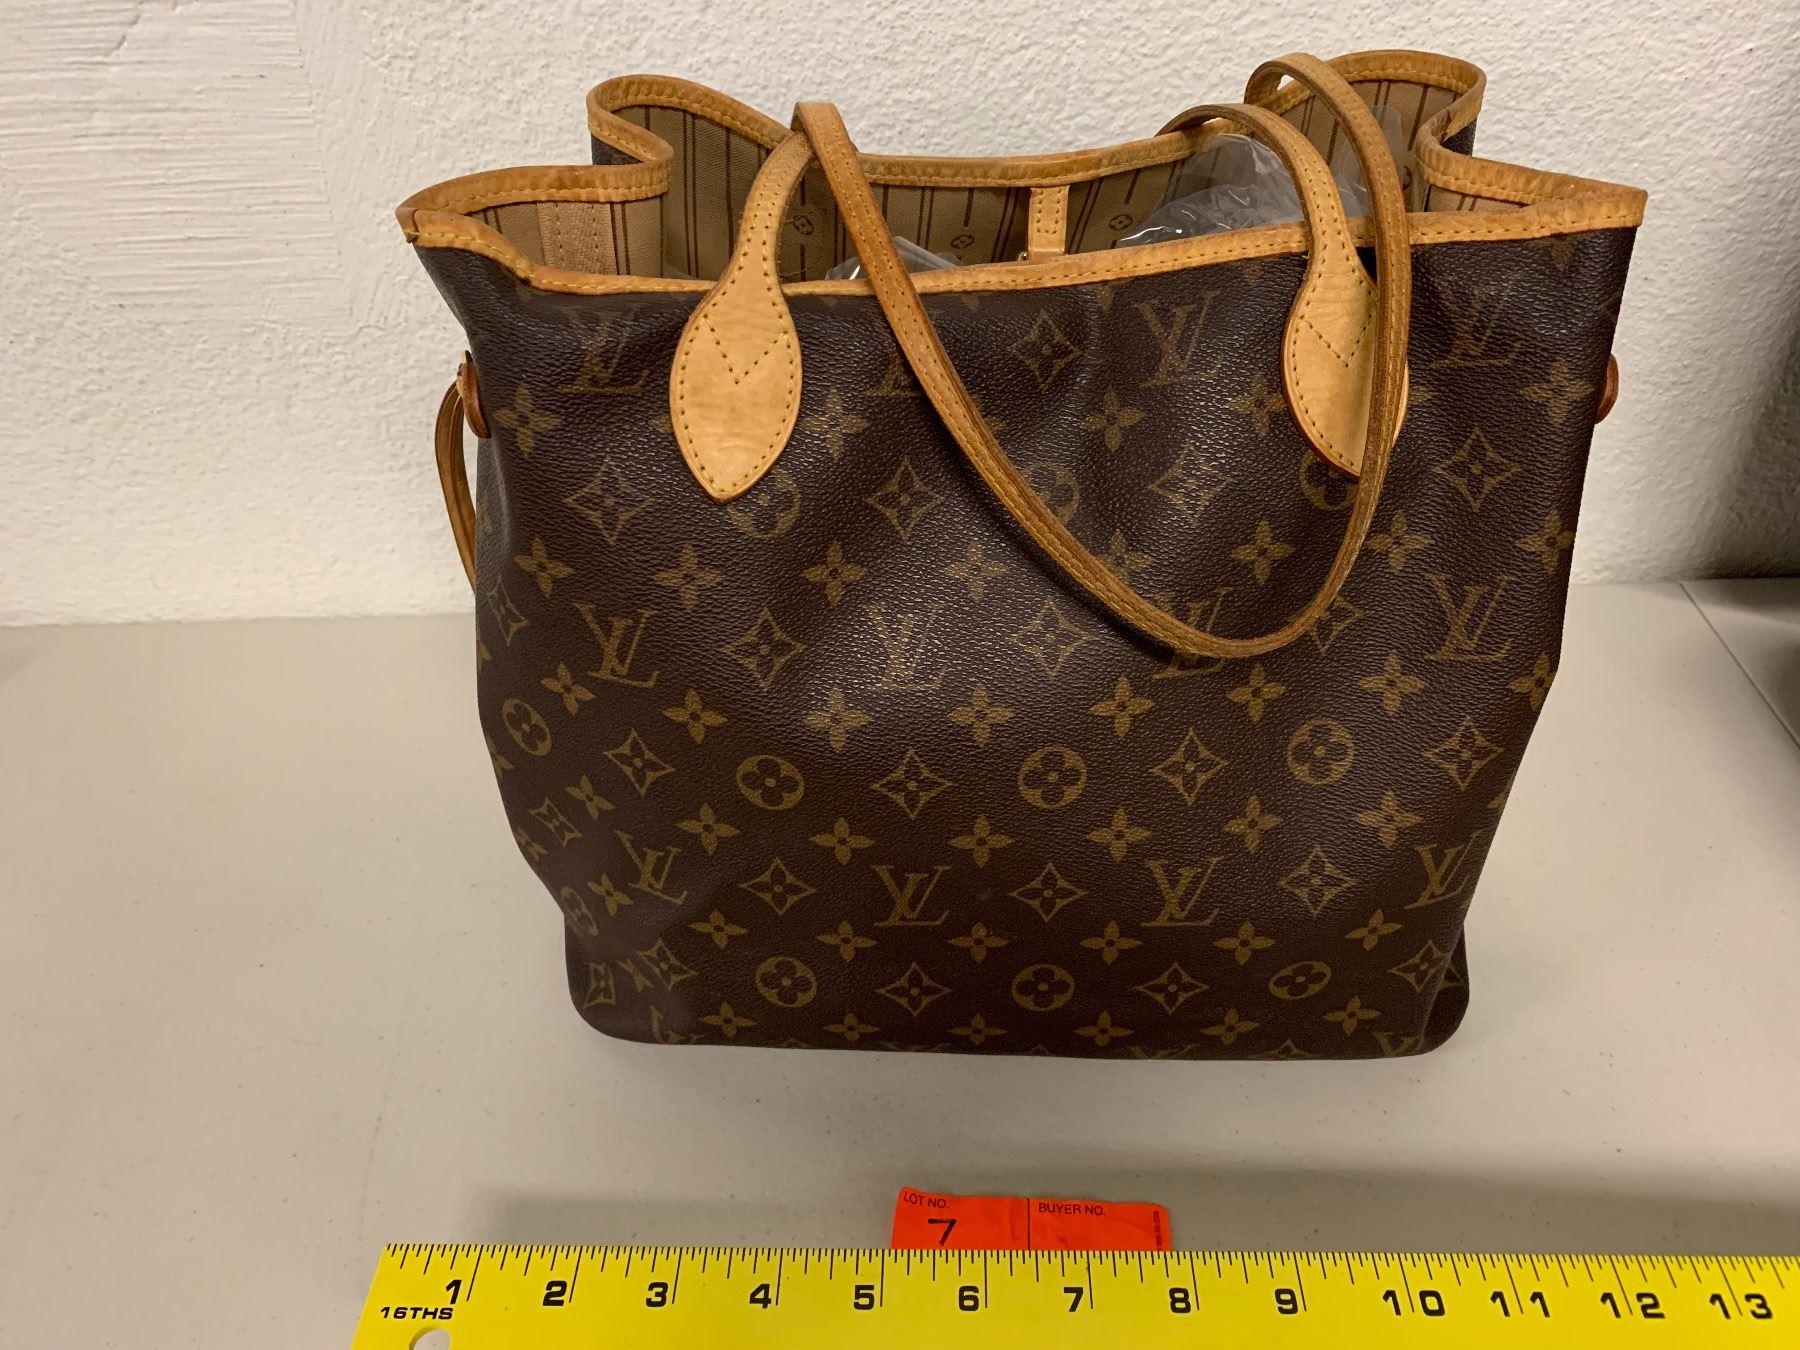 41bf769f4ebeb Image 1   Louis Vuitton Monogram Bag (Serial  SD2027) · Image 2 ...